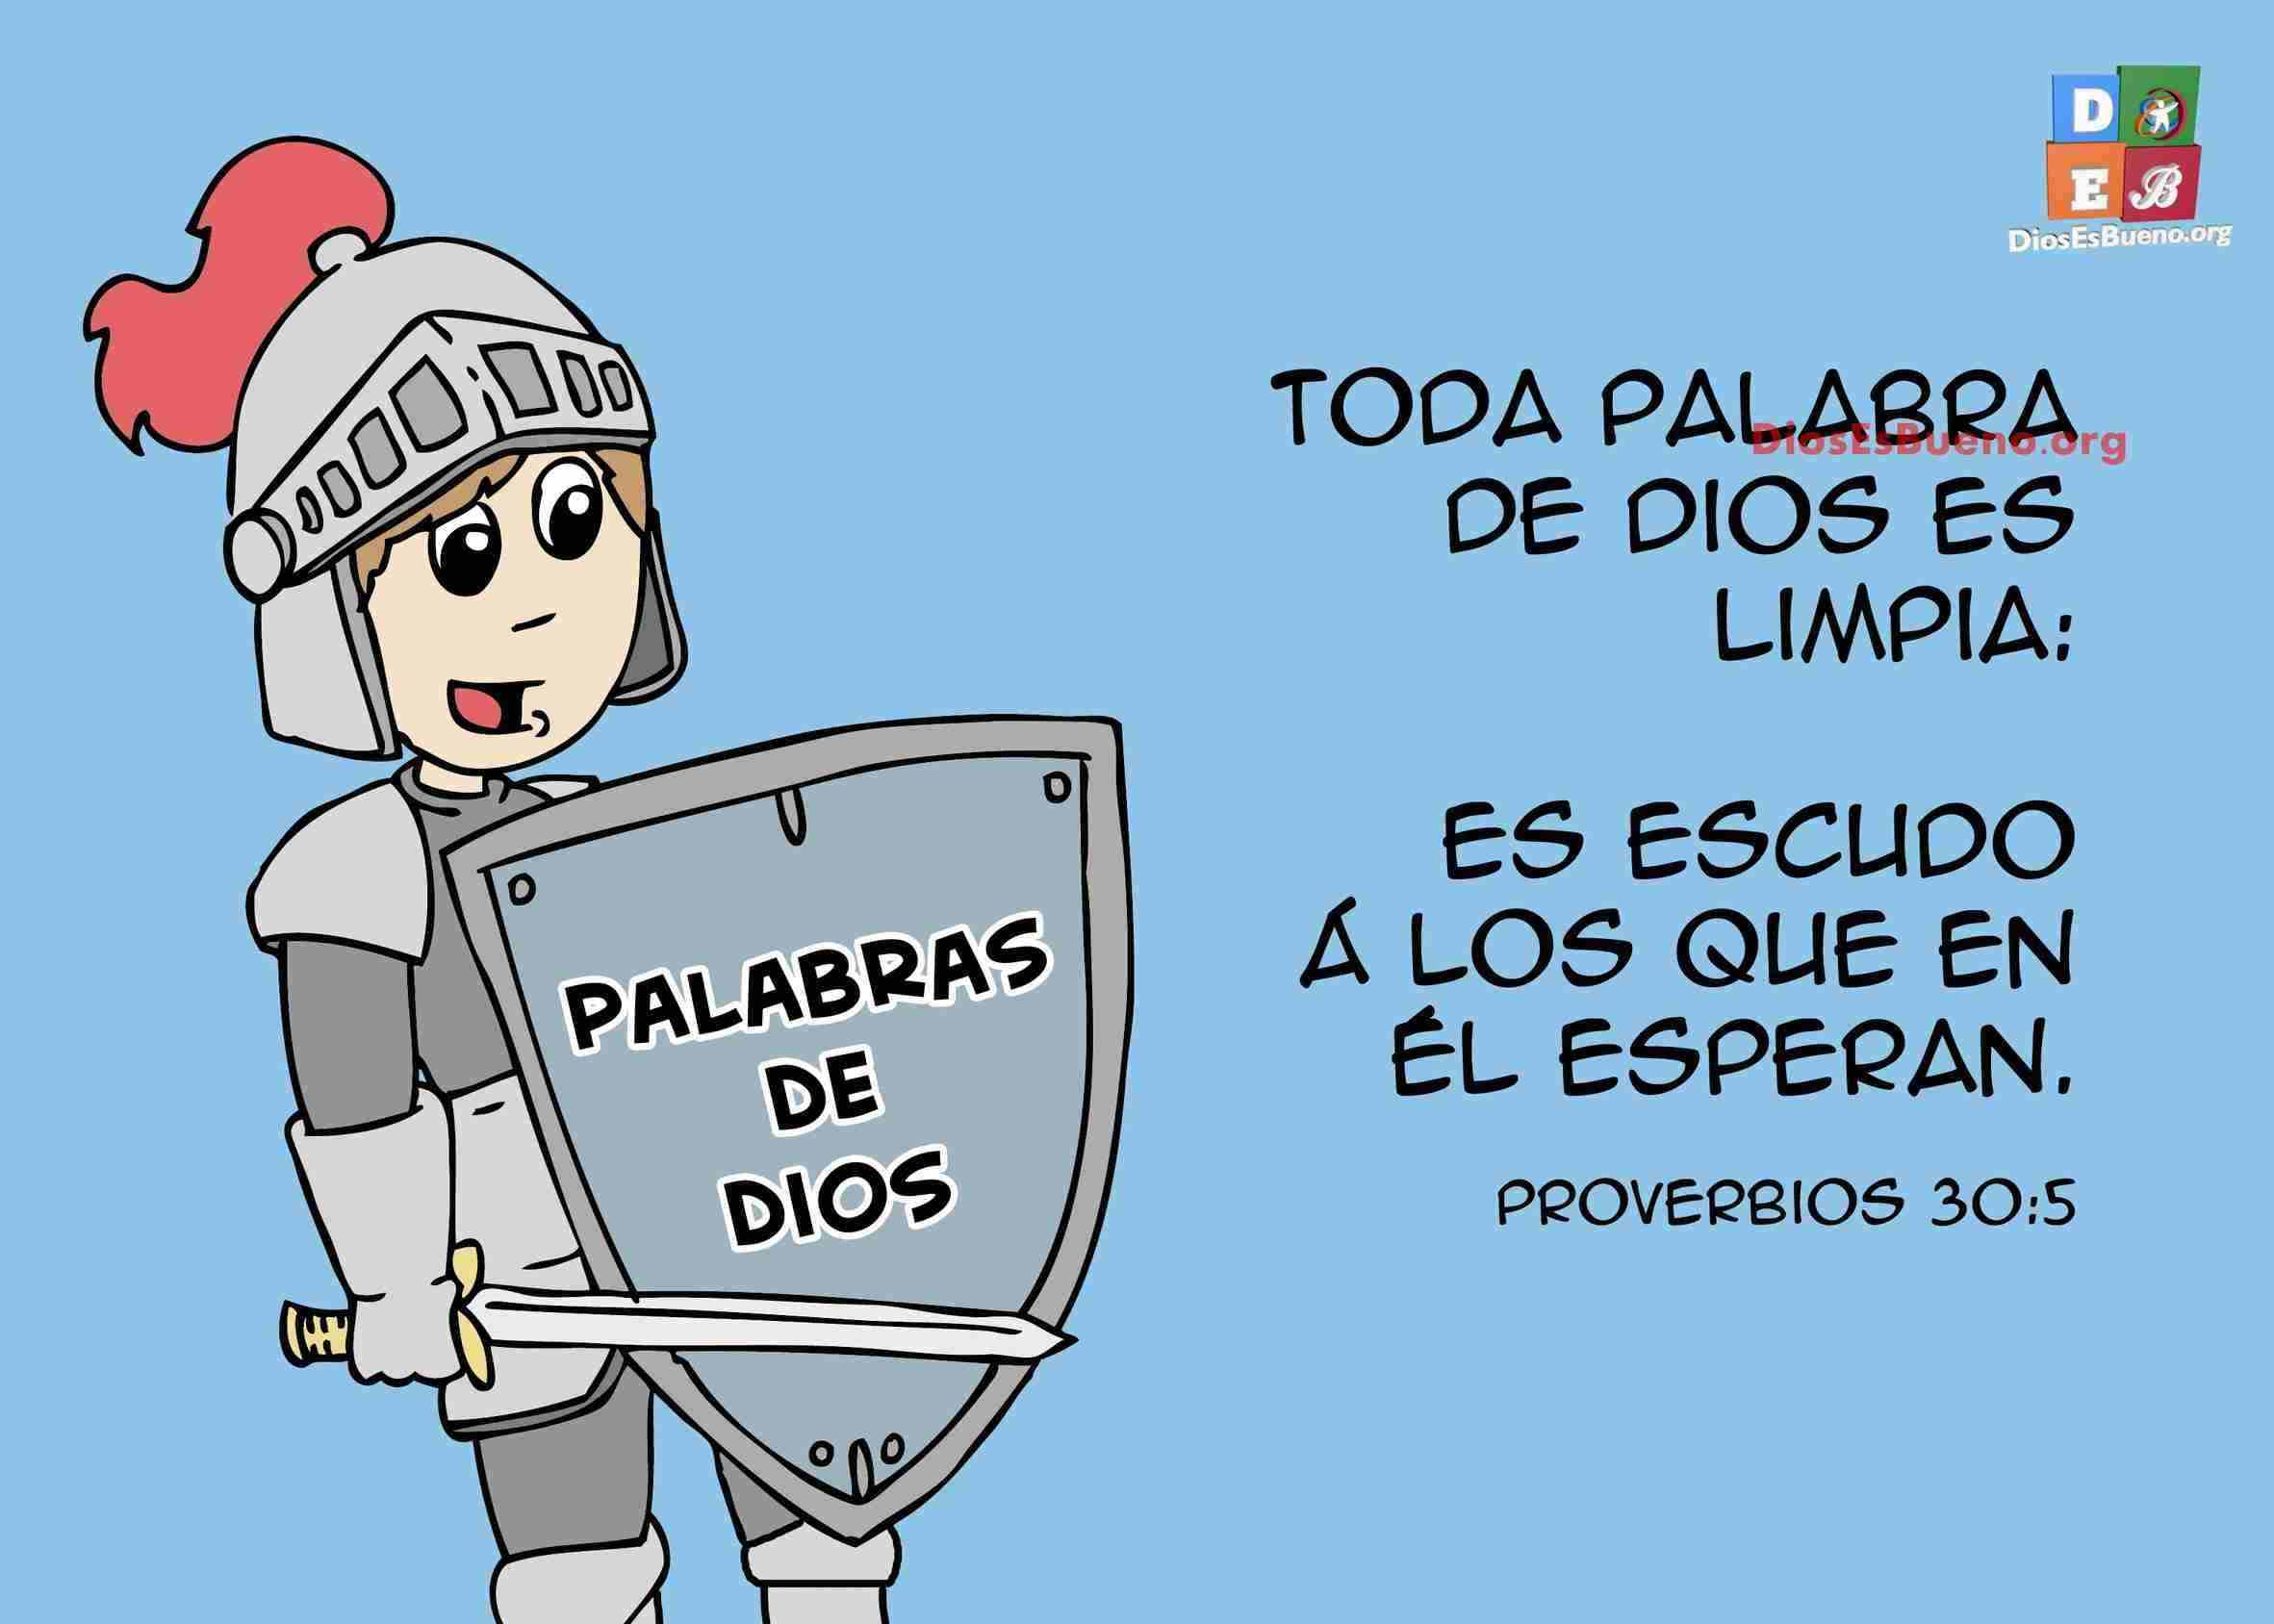 Proverbios 30-5